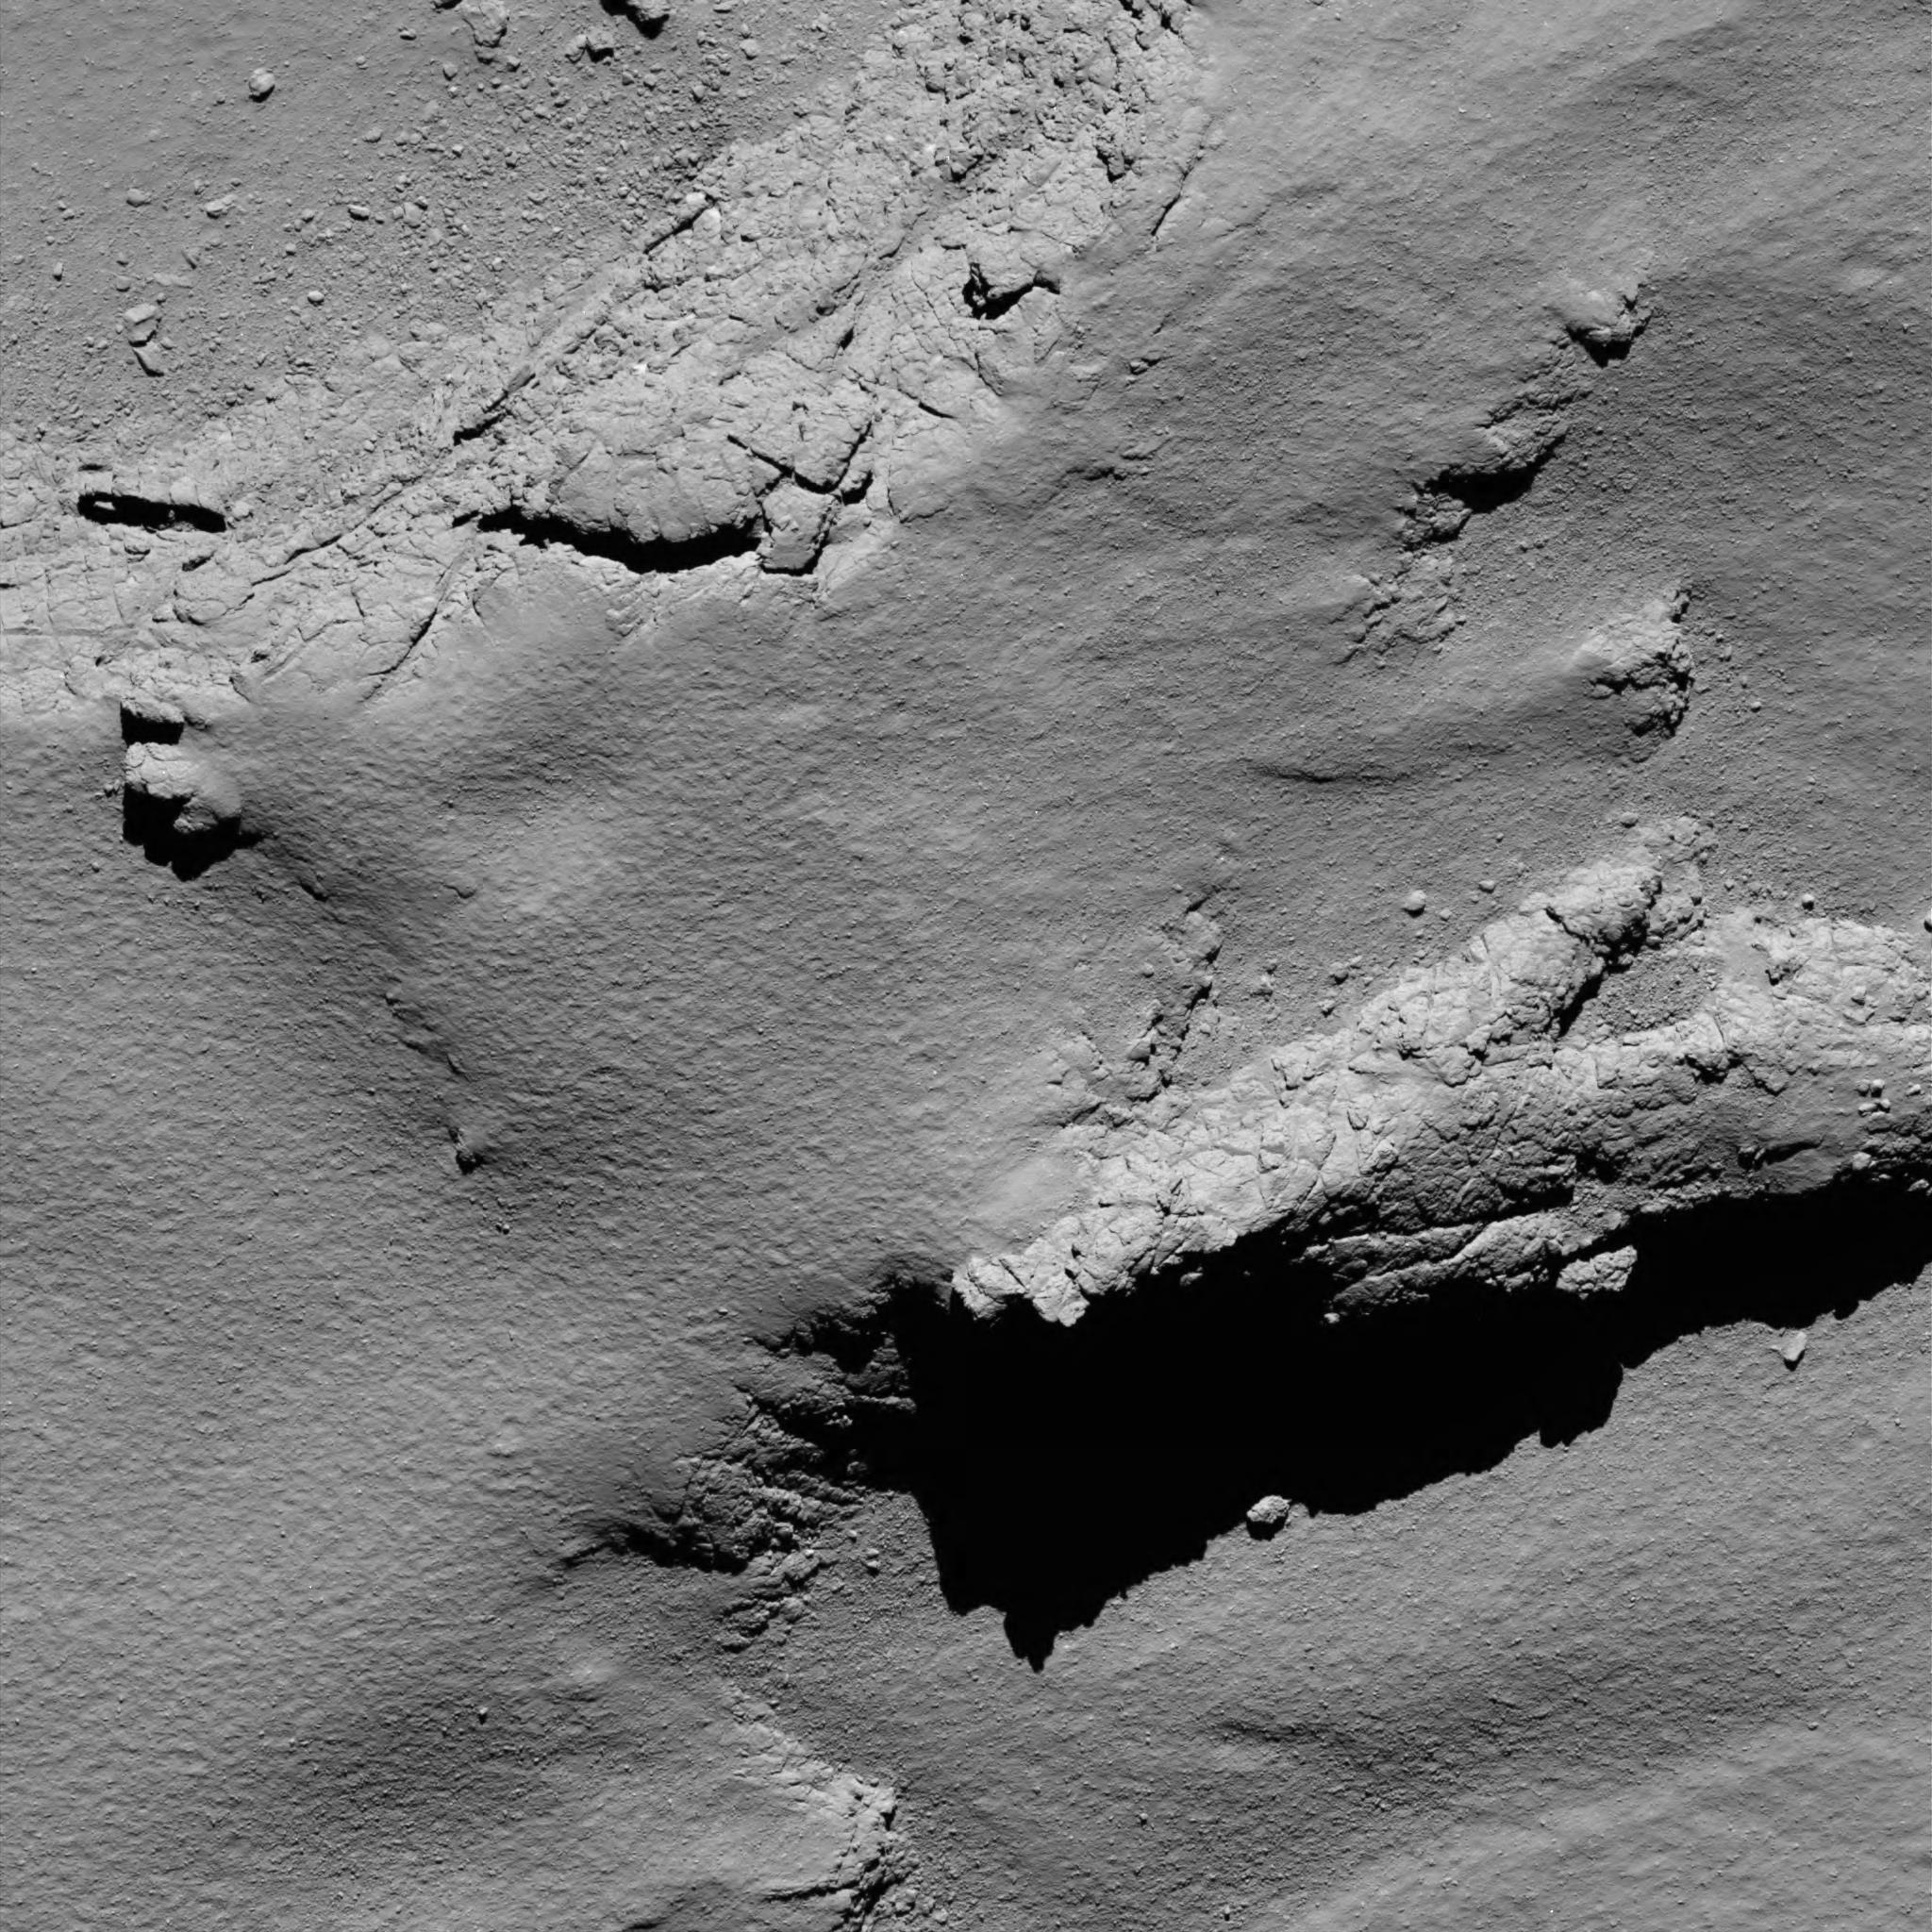 1567214854605-Rosetta_OSIRIS_NAC_Comet_67P_20160930T0821.jpg